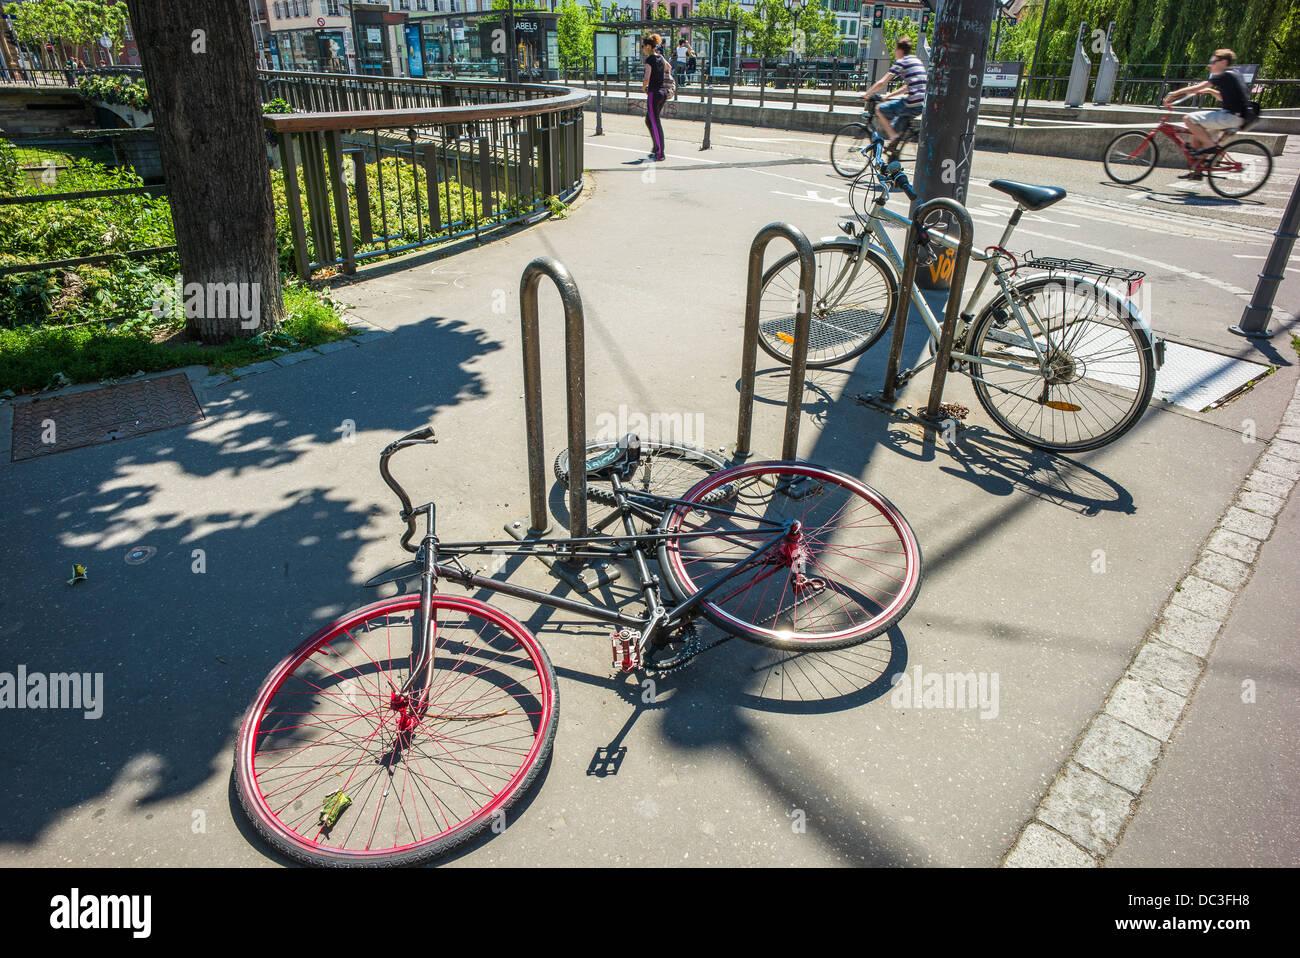 Vandalized bikes Strasbourg Alsace France - Stock Image